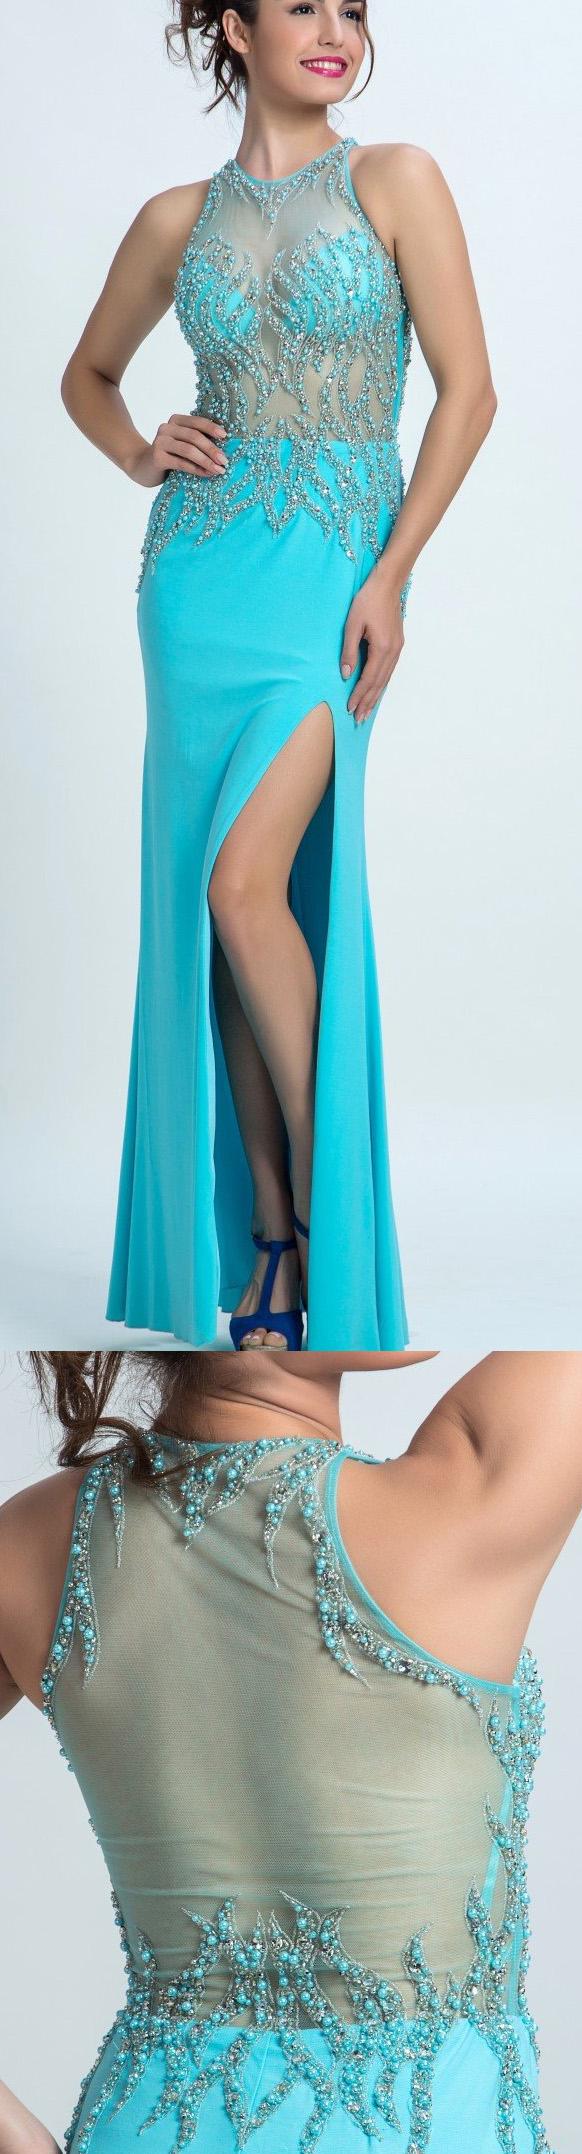 Floorlength prom evening dress long light blue dresses with side